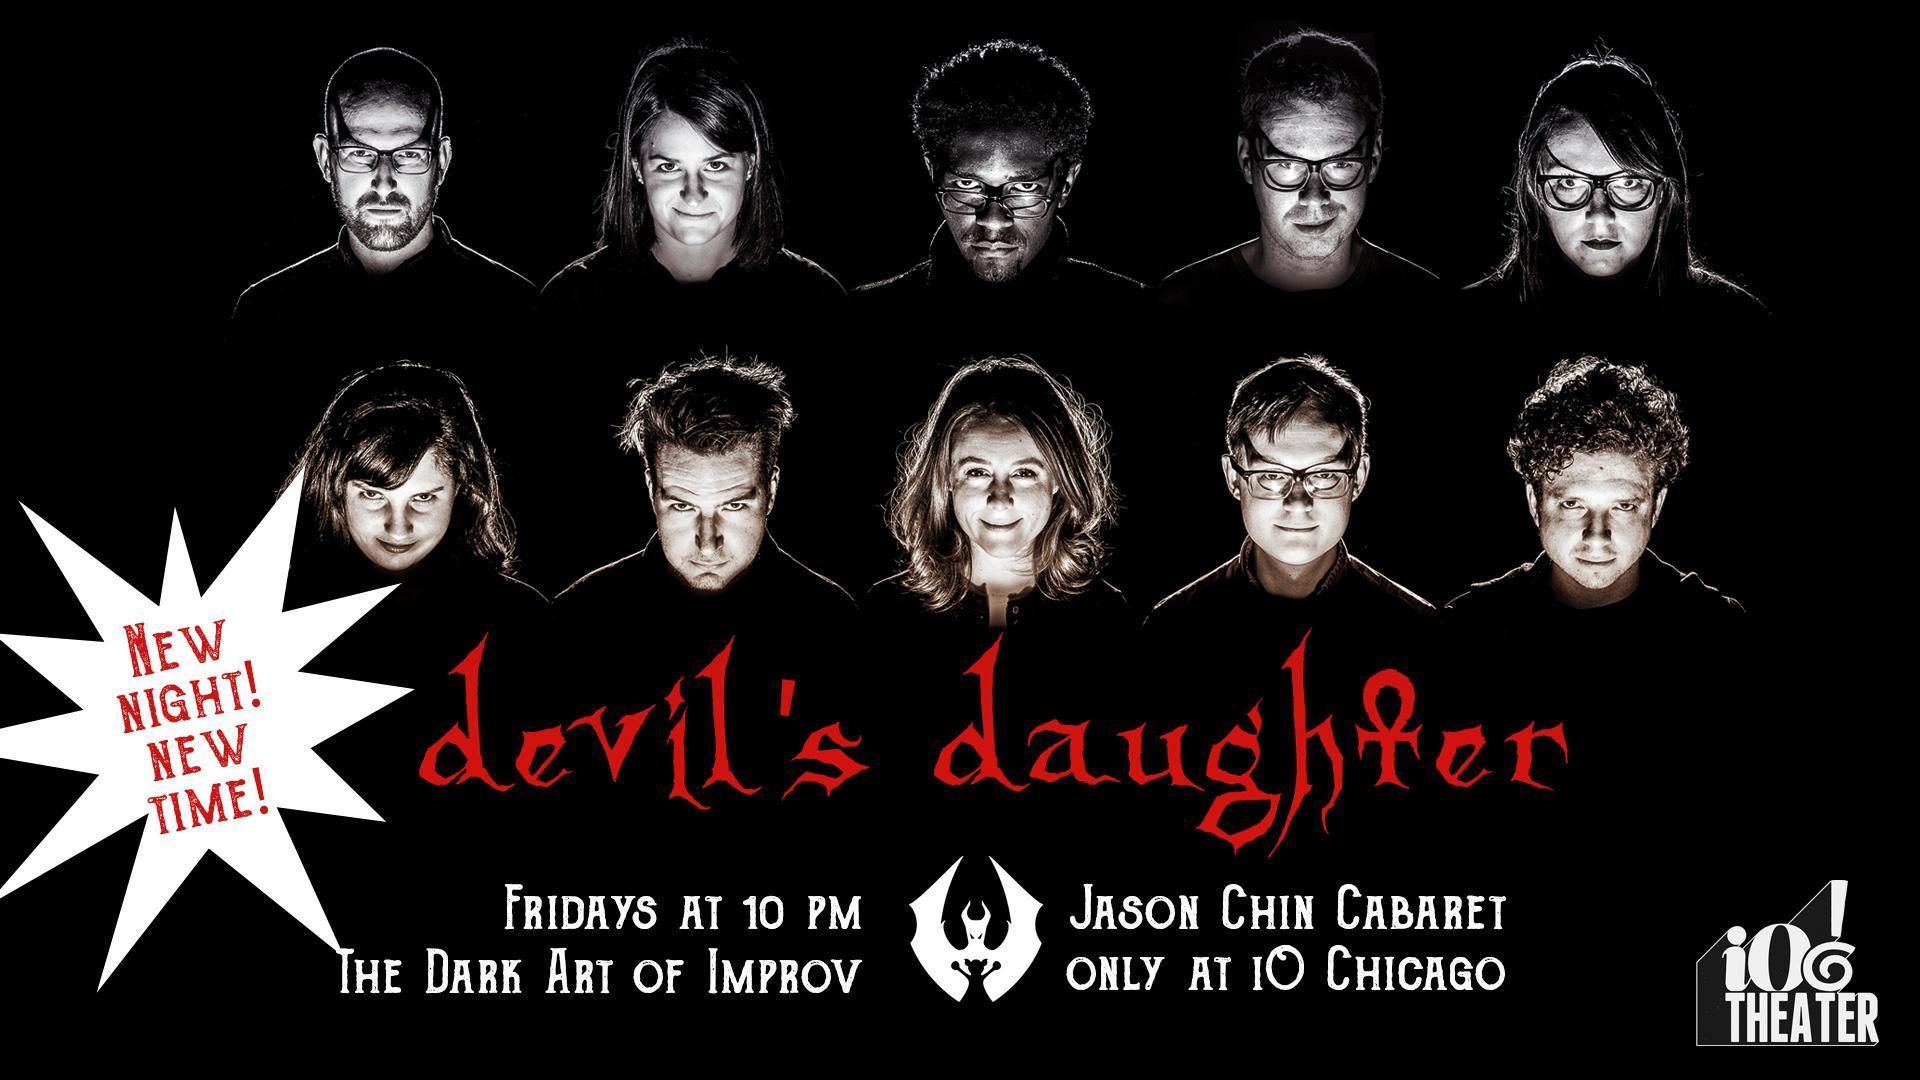 HAROLD NIGHT w/ Devil's Daughter & Artemis